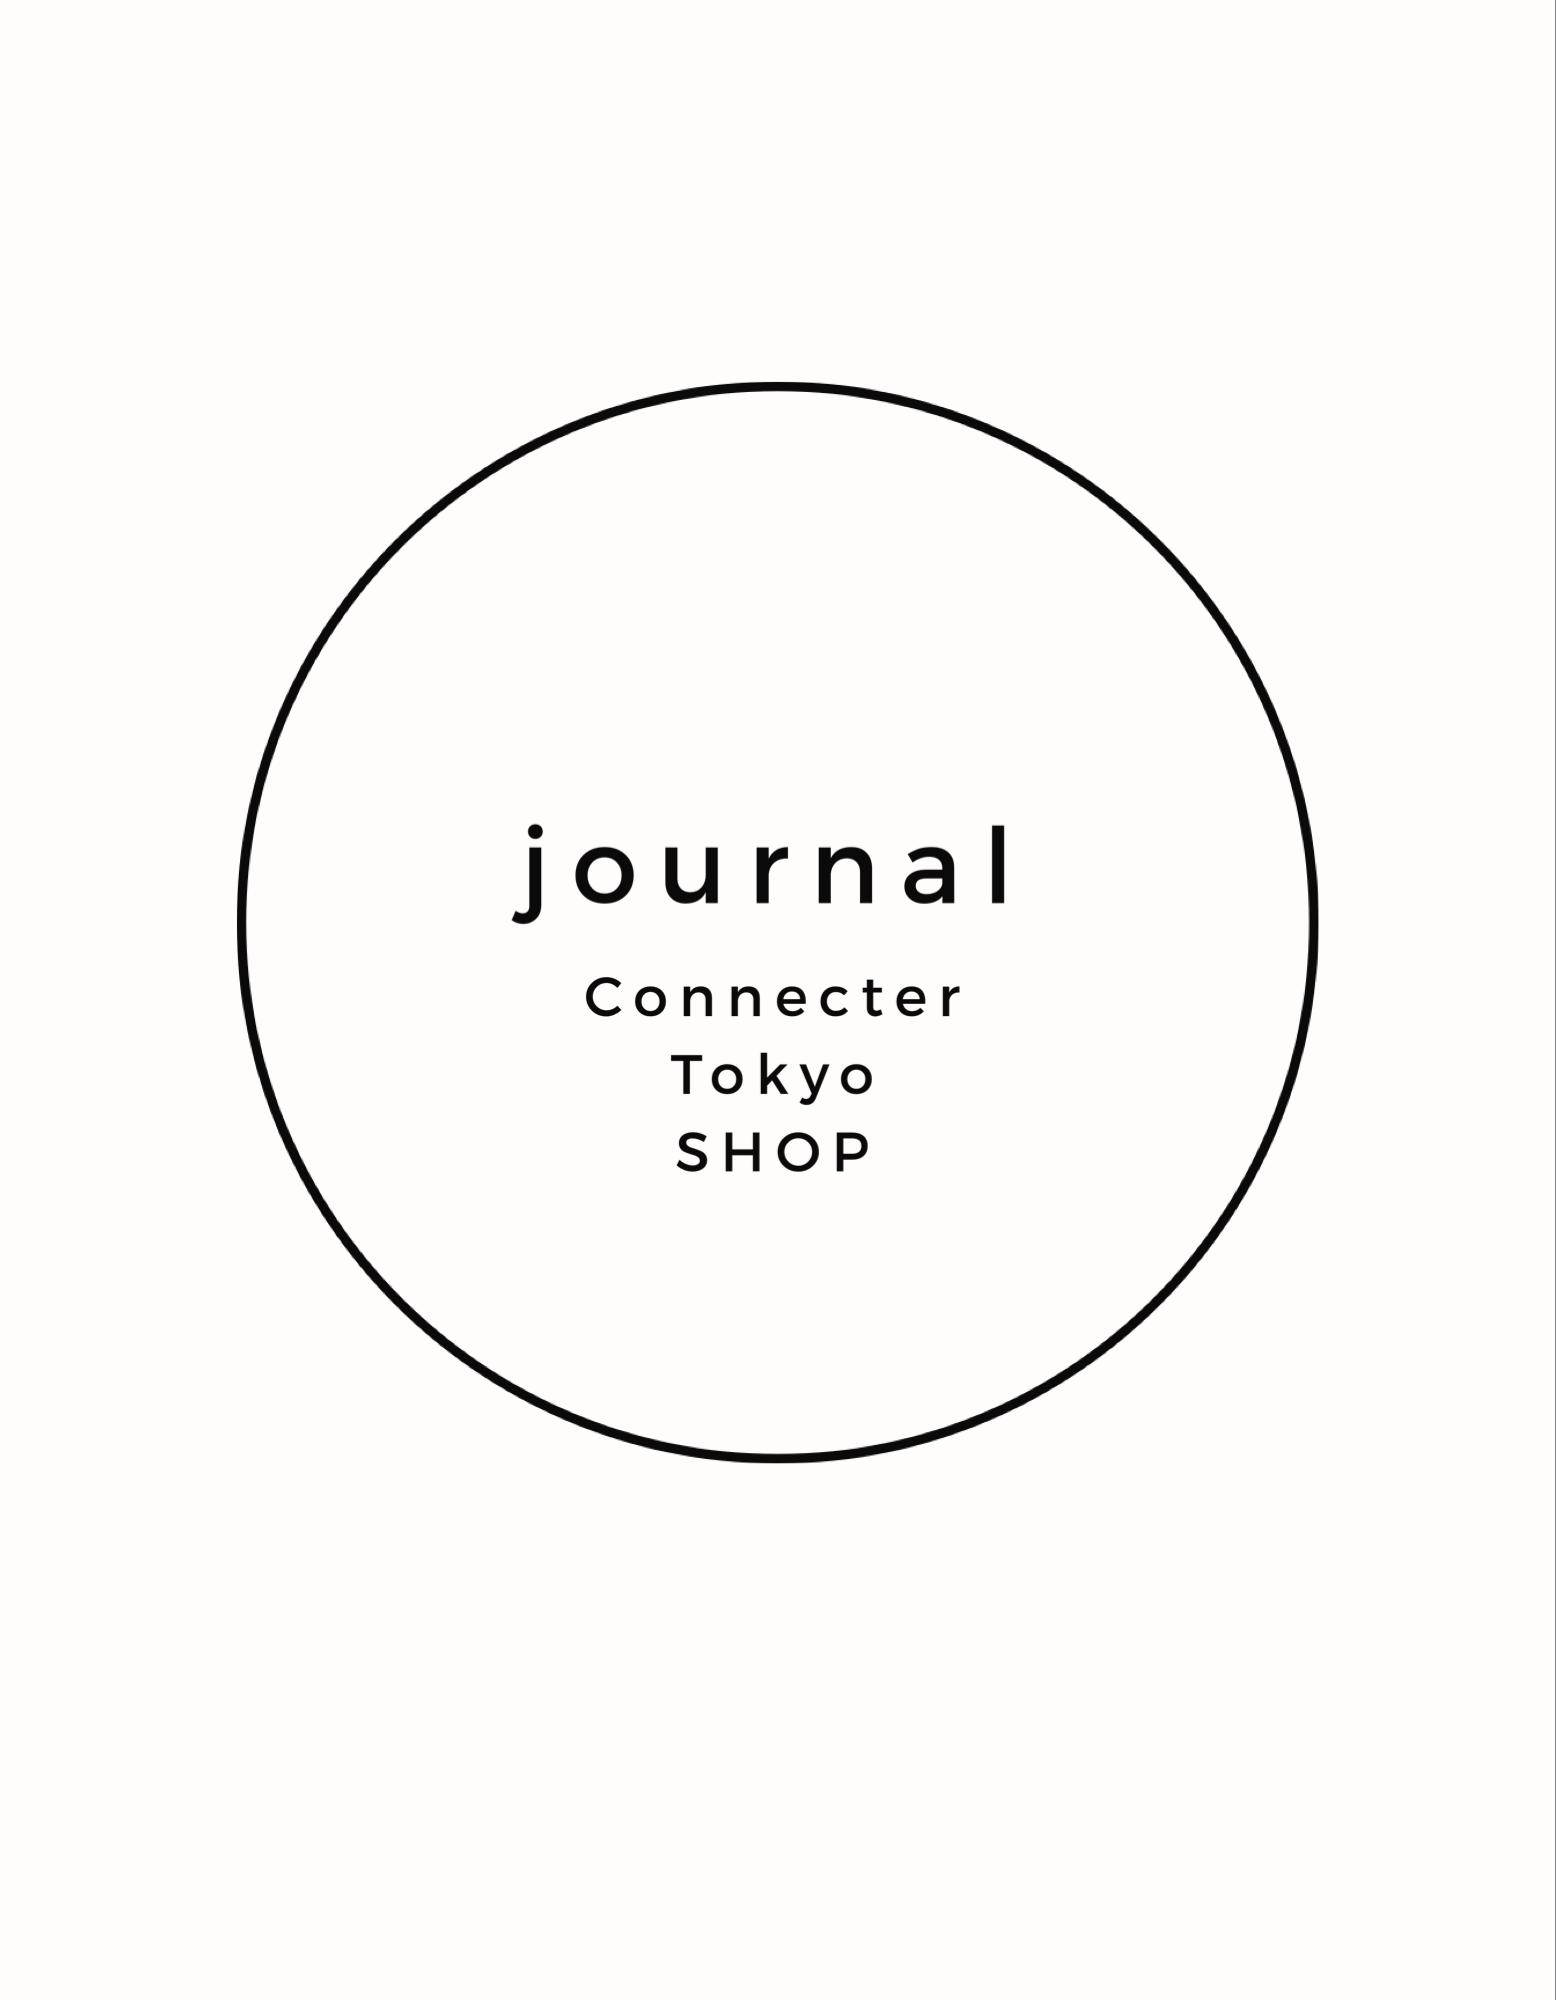 【journal】年末のバタバタと来年はやりますよっていう 話し。